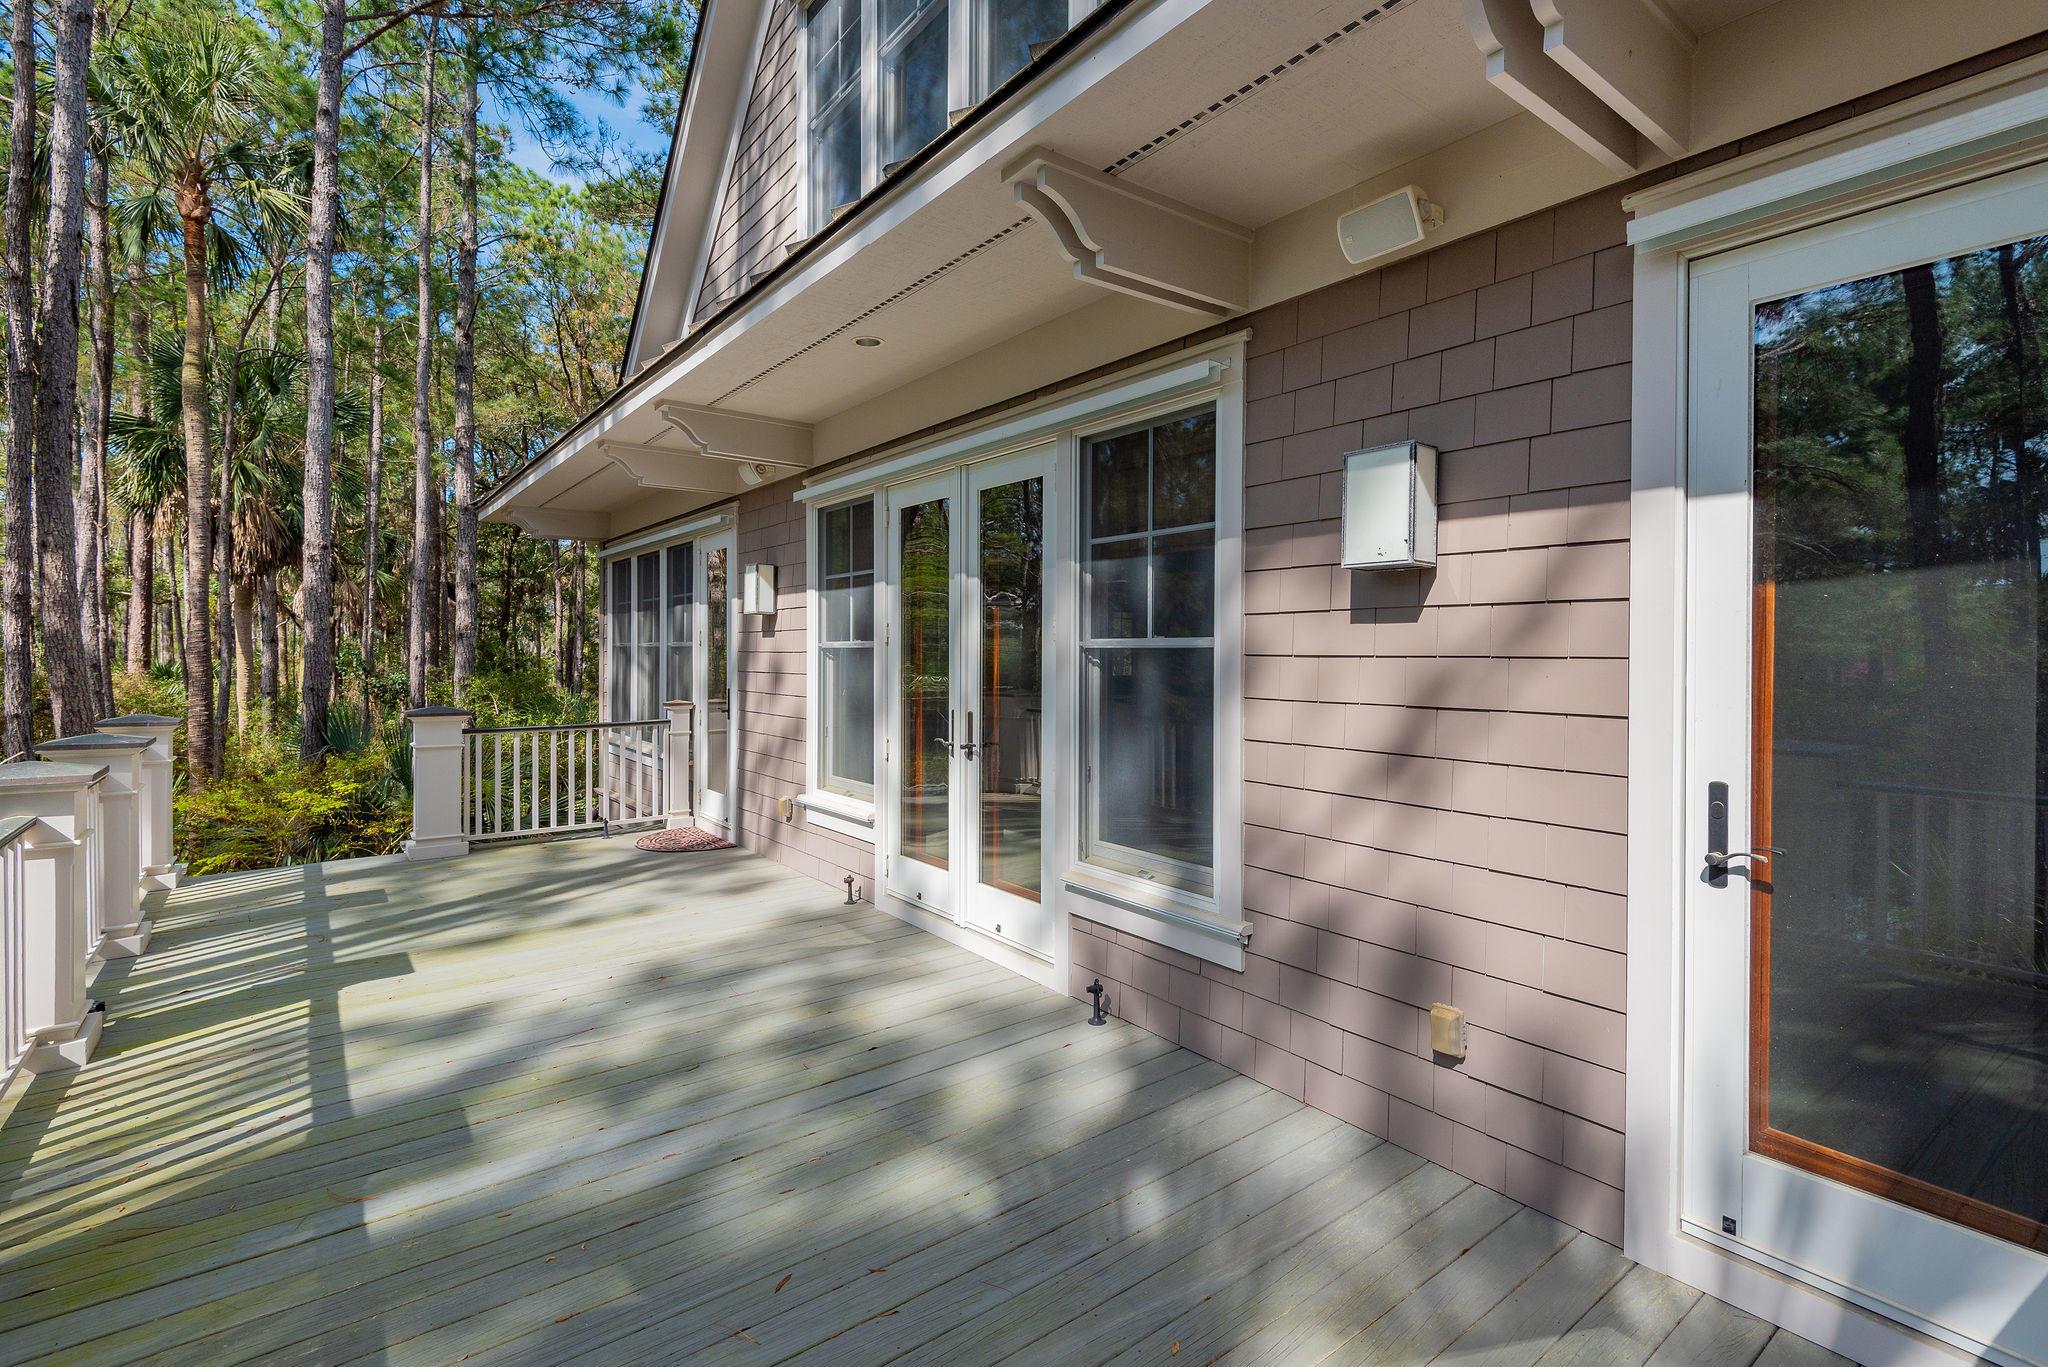 Kiawah Island Homes For Sale - 3 Grey Widgeon, Kiawah Island, SC - 8